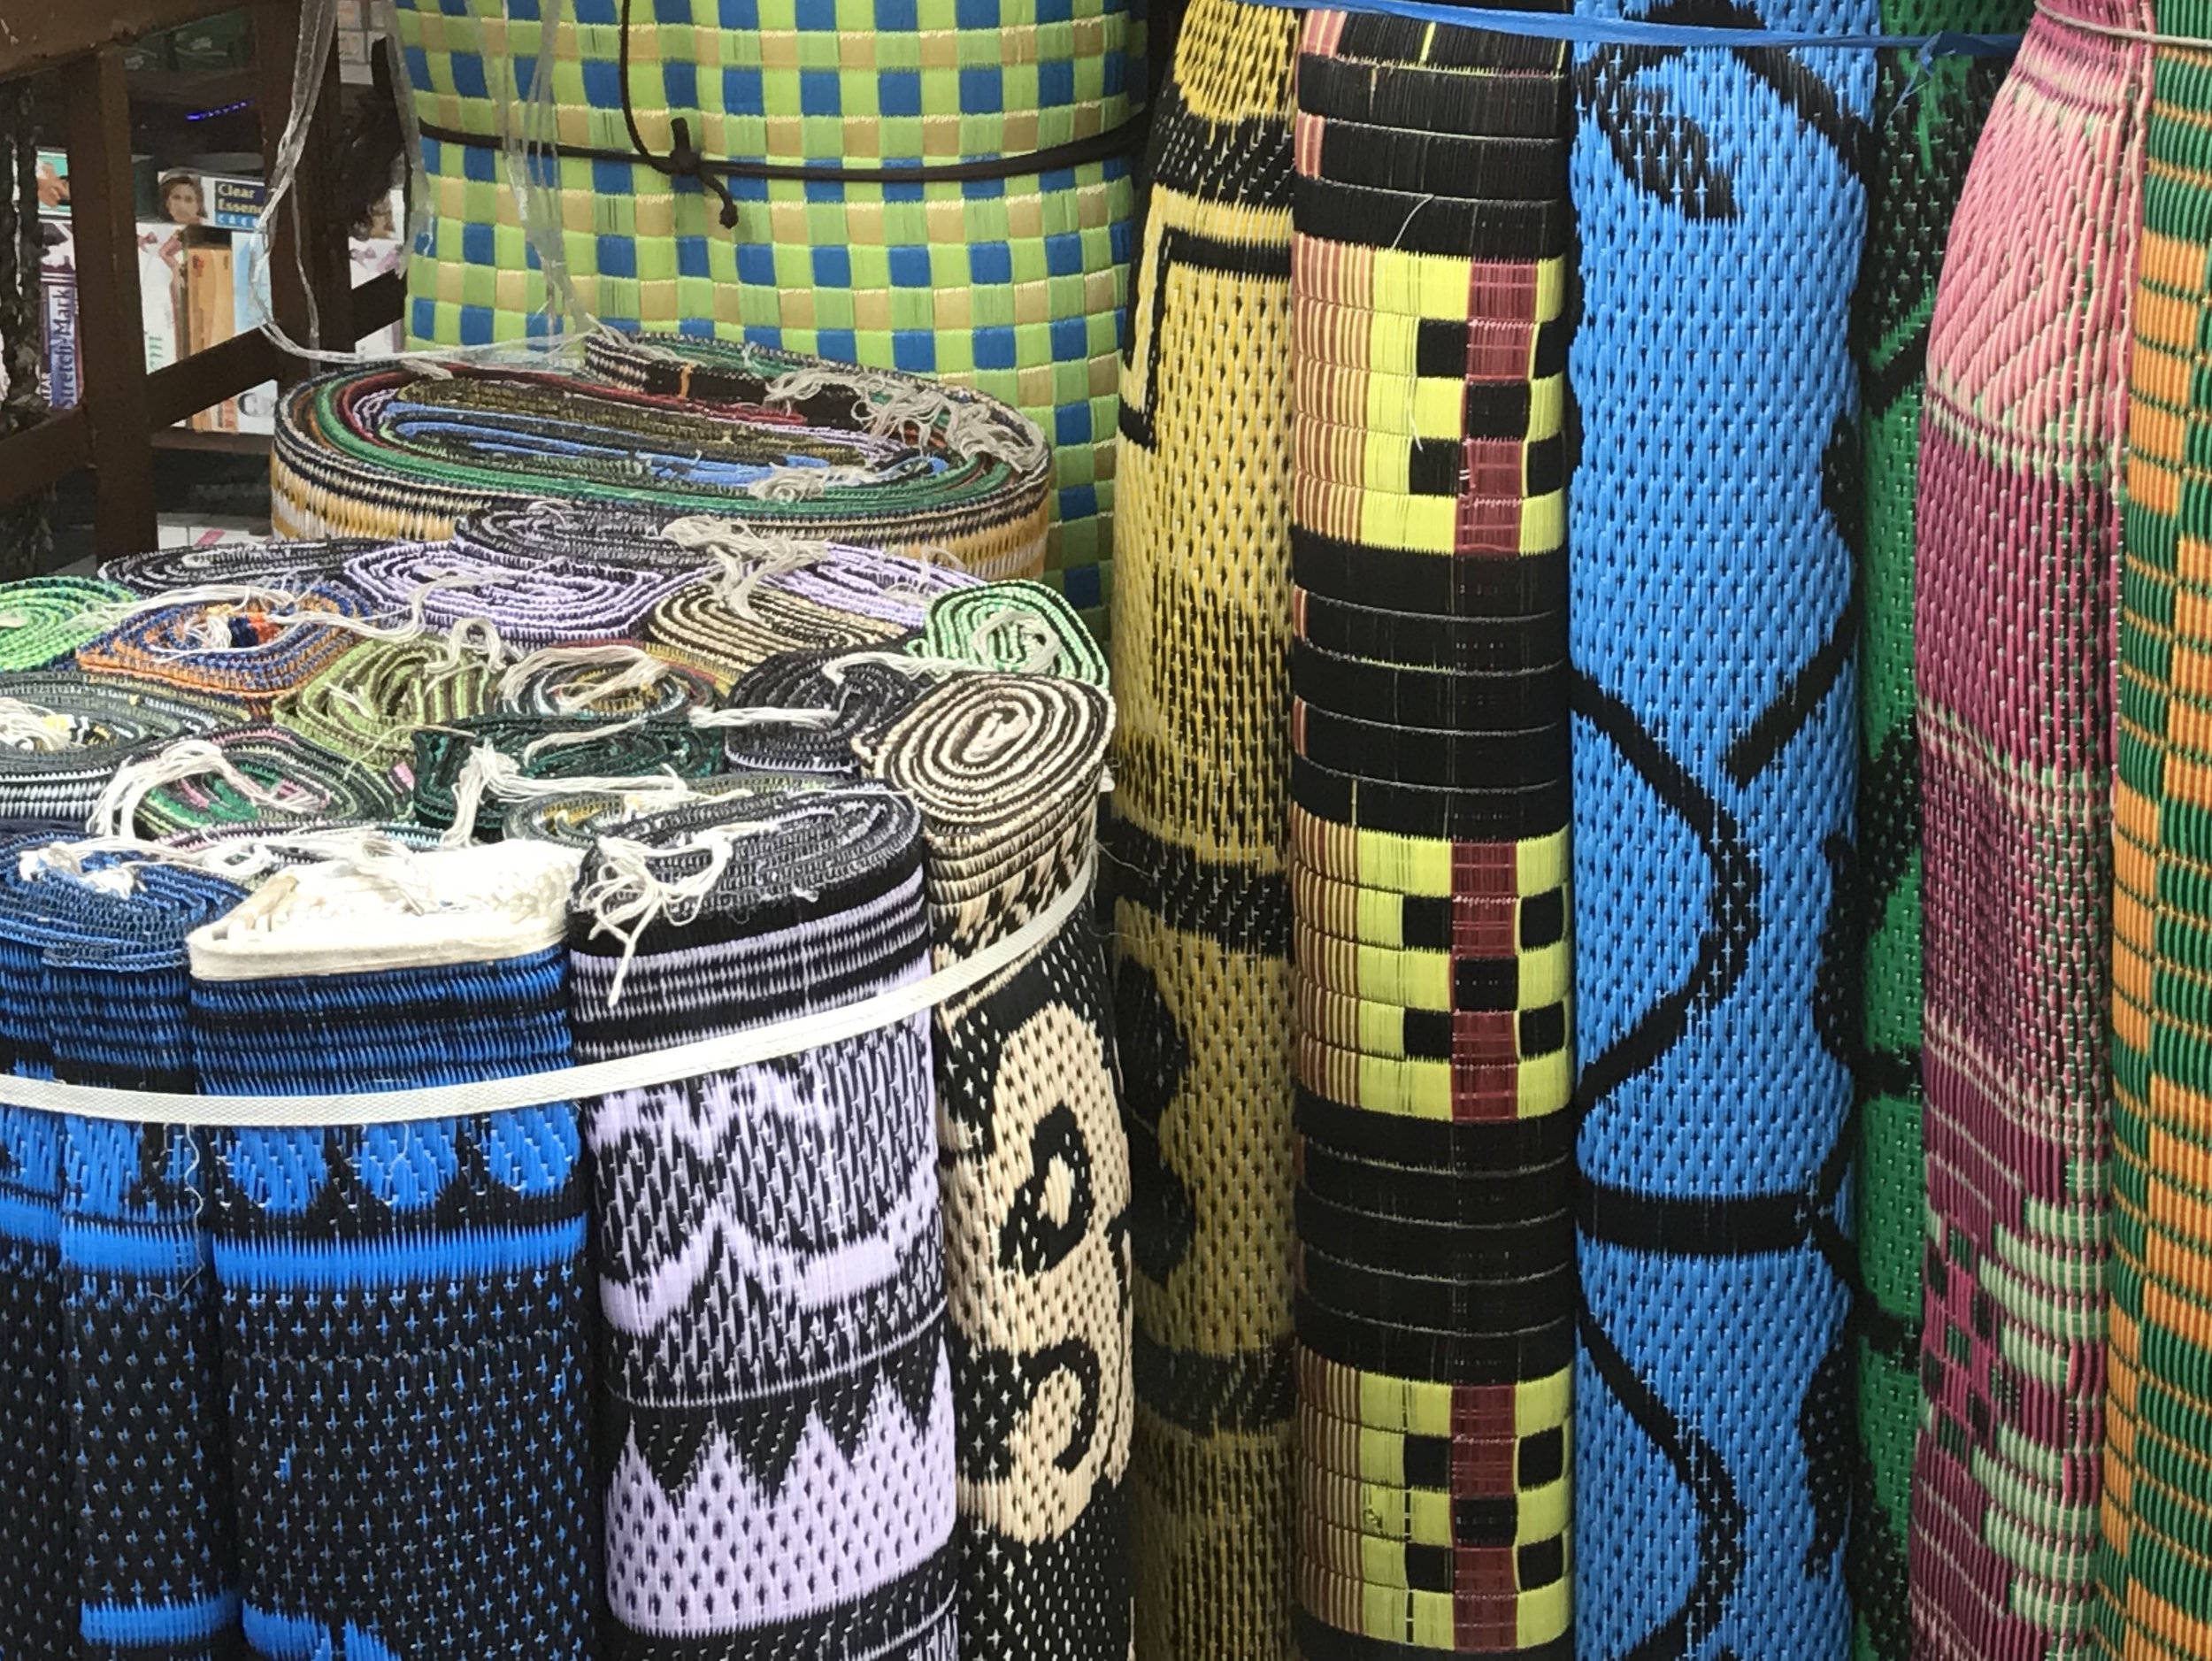 Islamic prayer mats for sale on the street